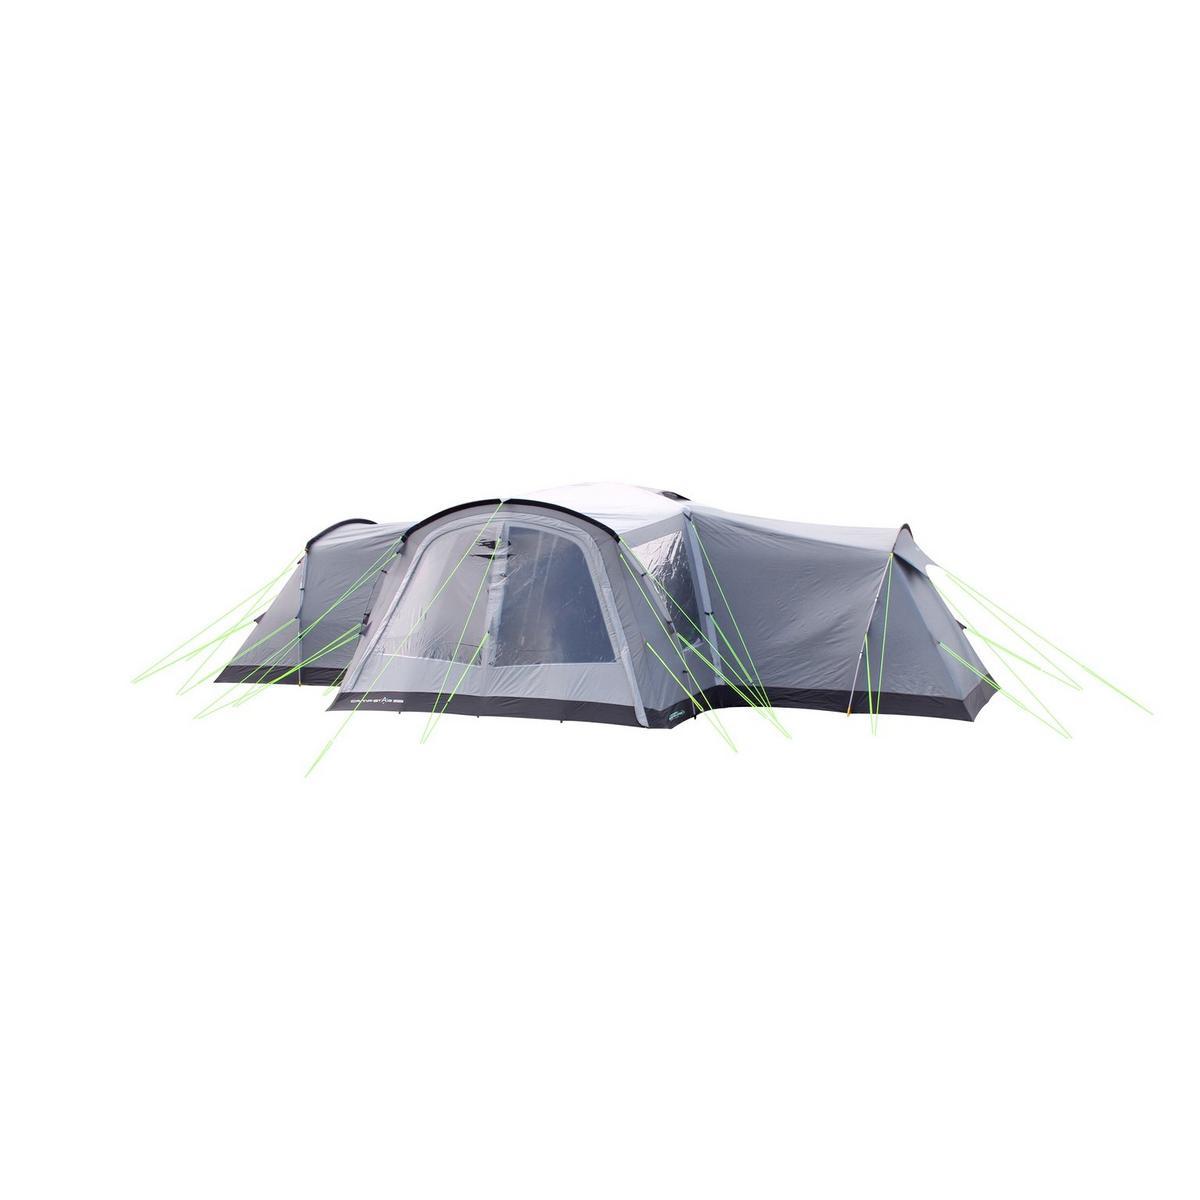 Outdoor Revolution CAMP STAR 500XL BUNDLE DEAL